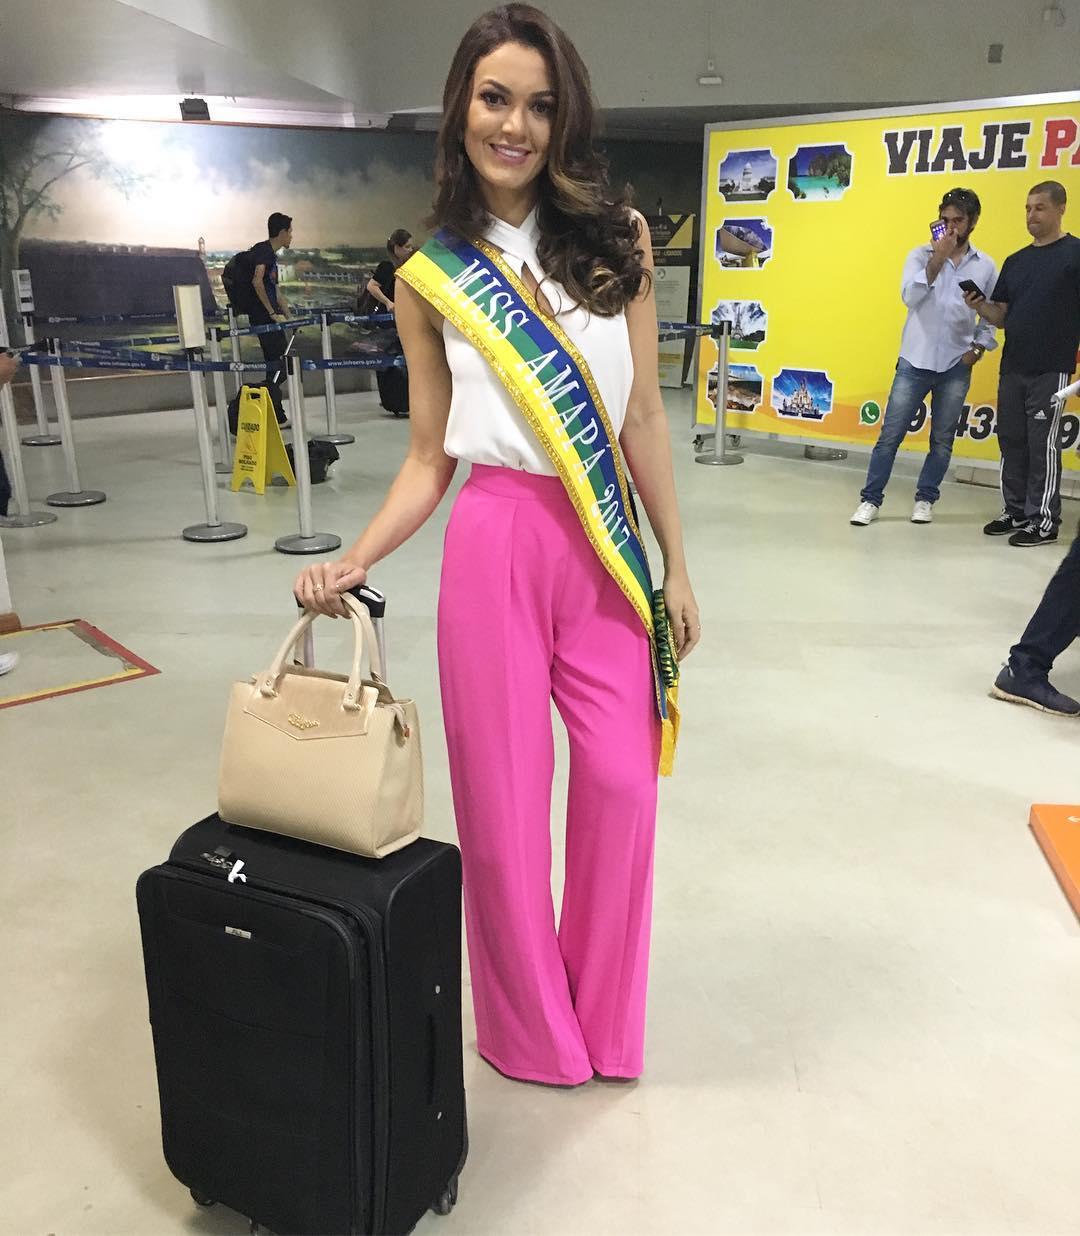 jessica pacheco, miss amapa universo 2017. Ffl5s5kp